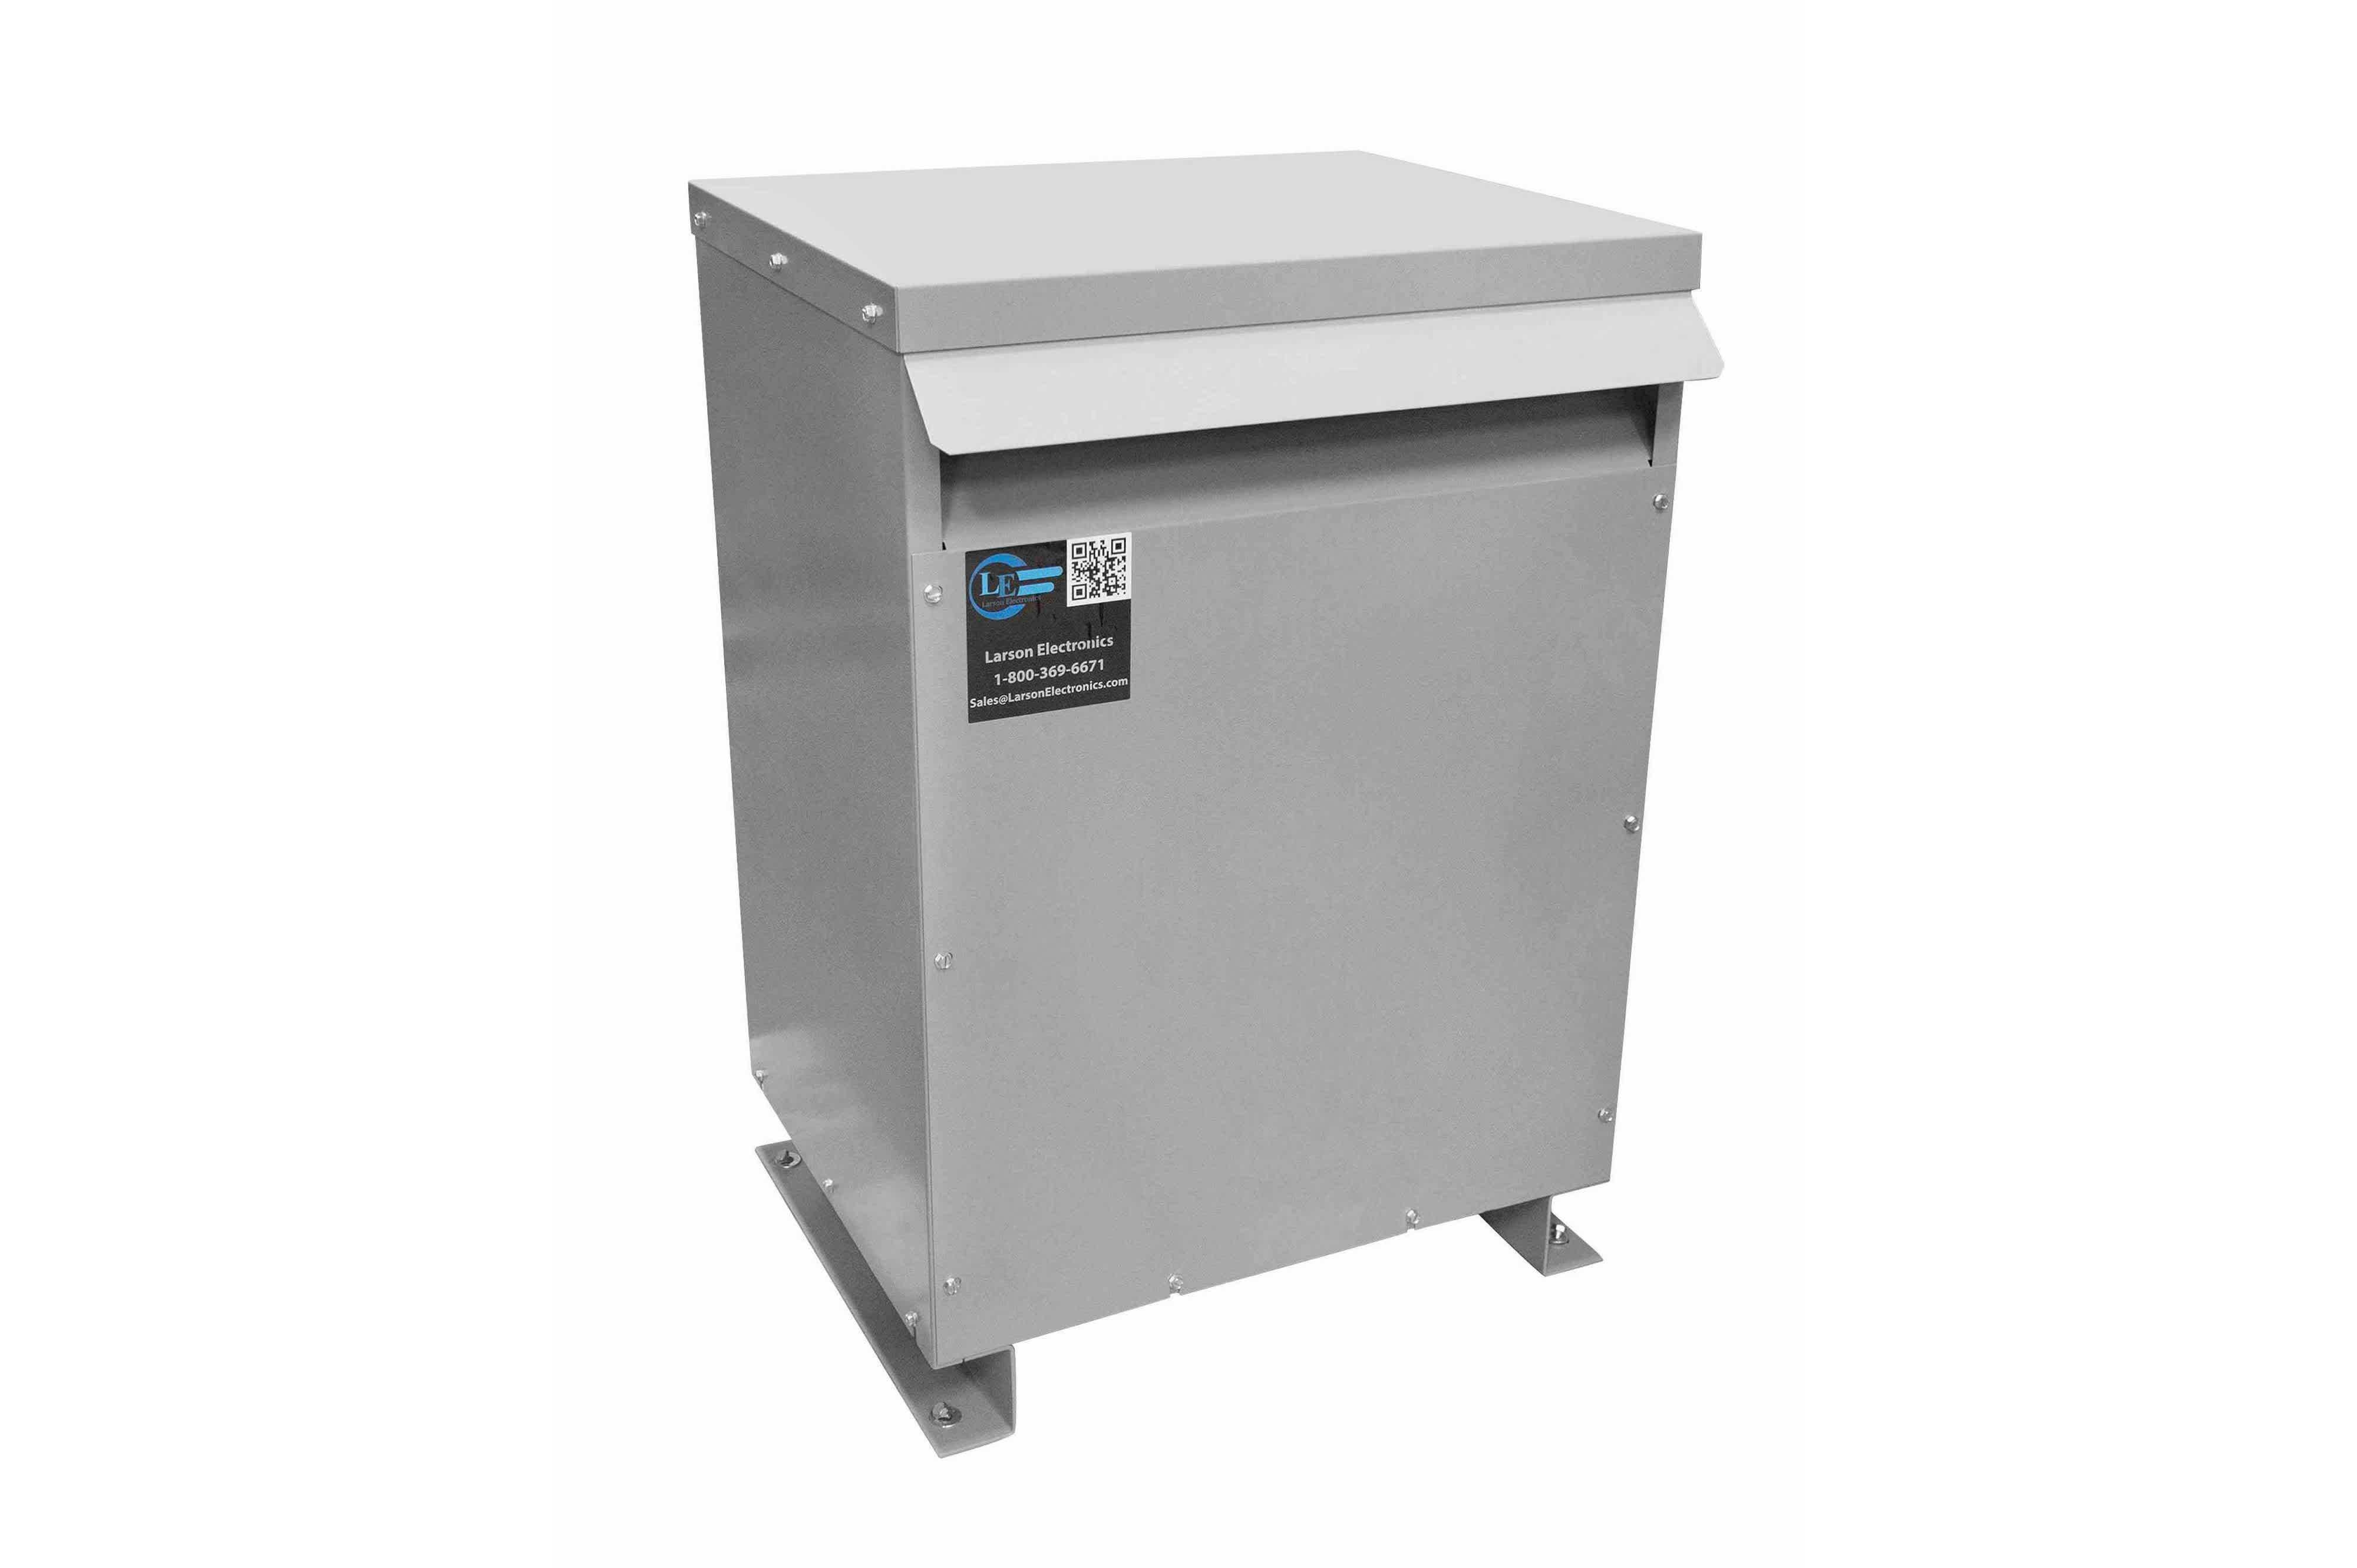 175 kVA 3PH Isolation Transformer, 460V Wye Primary, 380Y/220 Wye-N Secondary, N3R, Ventilated, 60 Hz